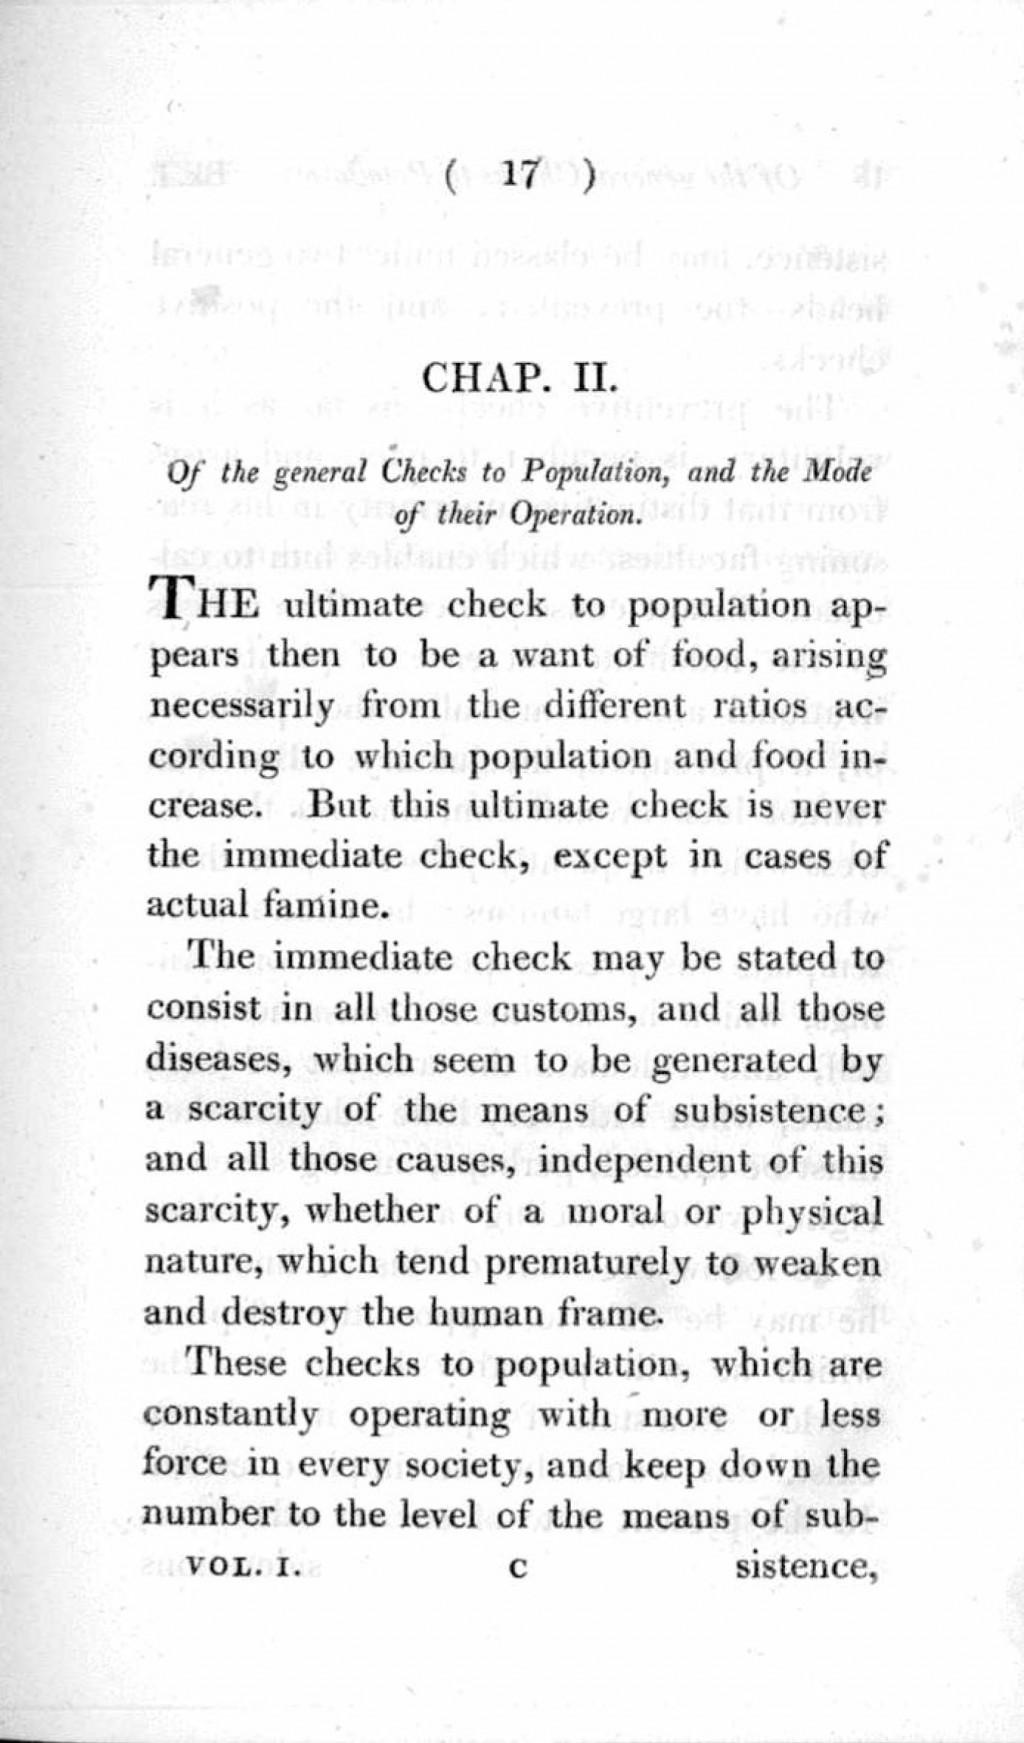 009 Thomas Malthus Essay On The Principle Of Population Stupendous After Reading Malthus's Principles Darwin Got Idea That Ap Euro Large